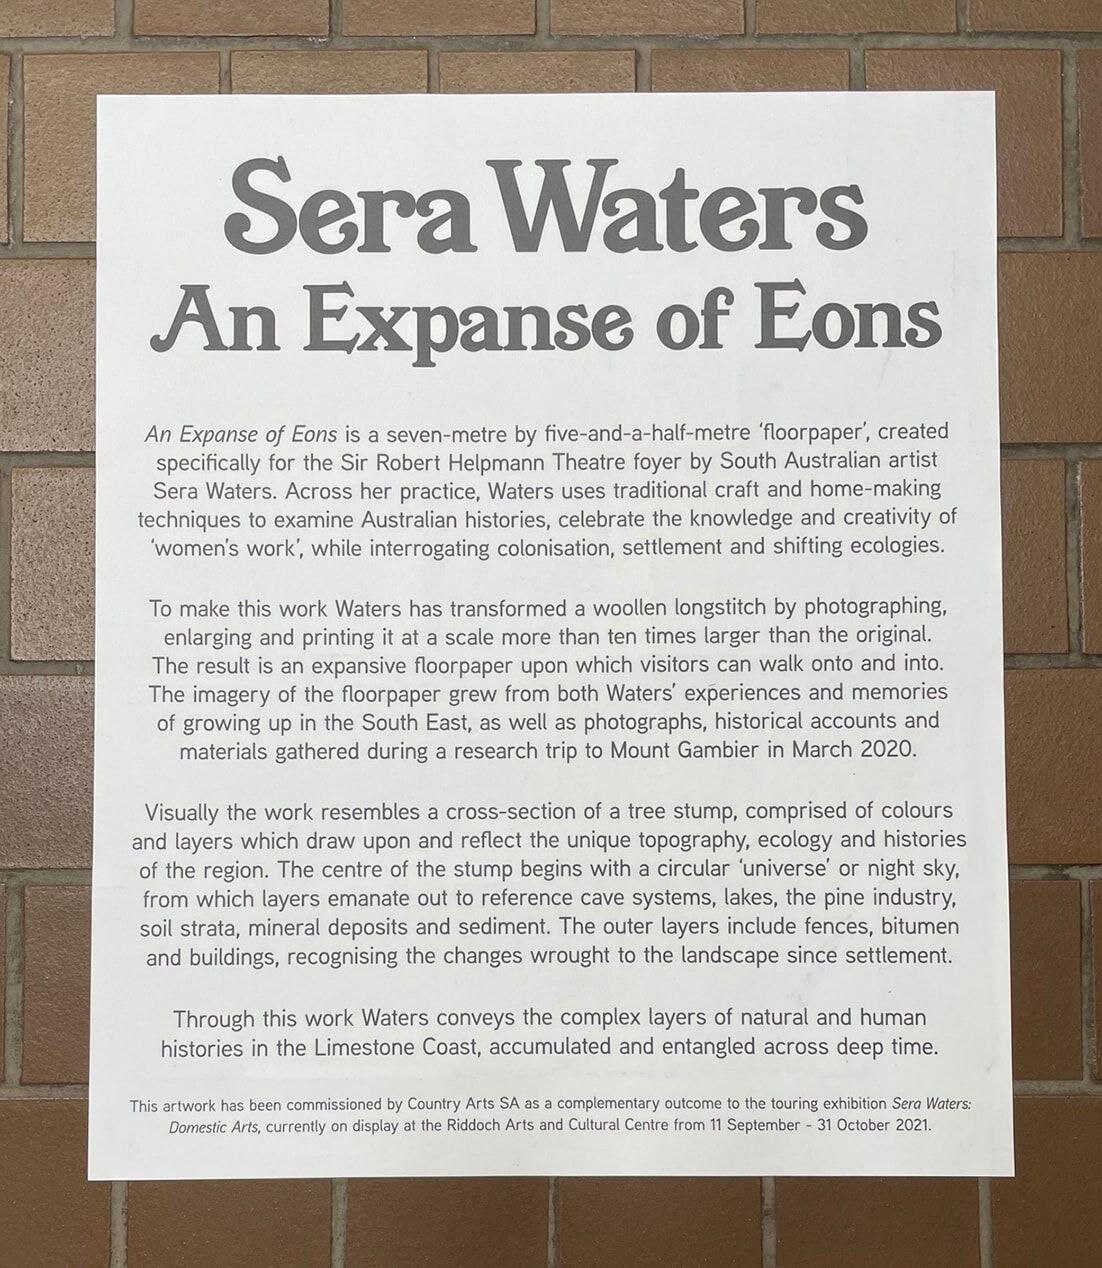 Expanse of Eons text